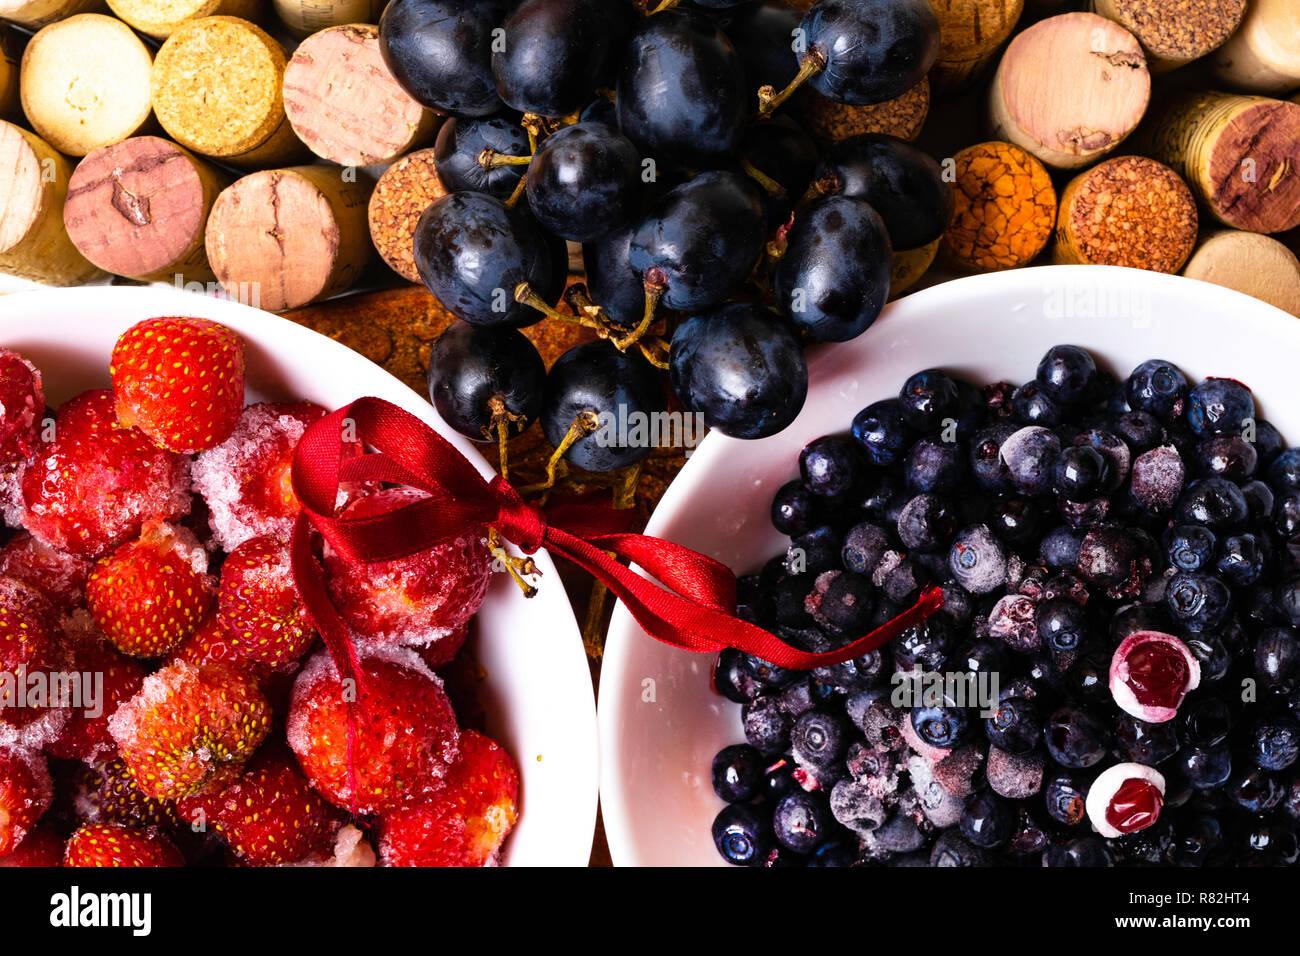 Strawberry Blueberry Grape On Wine Corks Antioxidants Resveratrol Flavonoids Rich Food Stock Photo Alamy